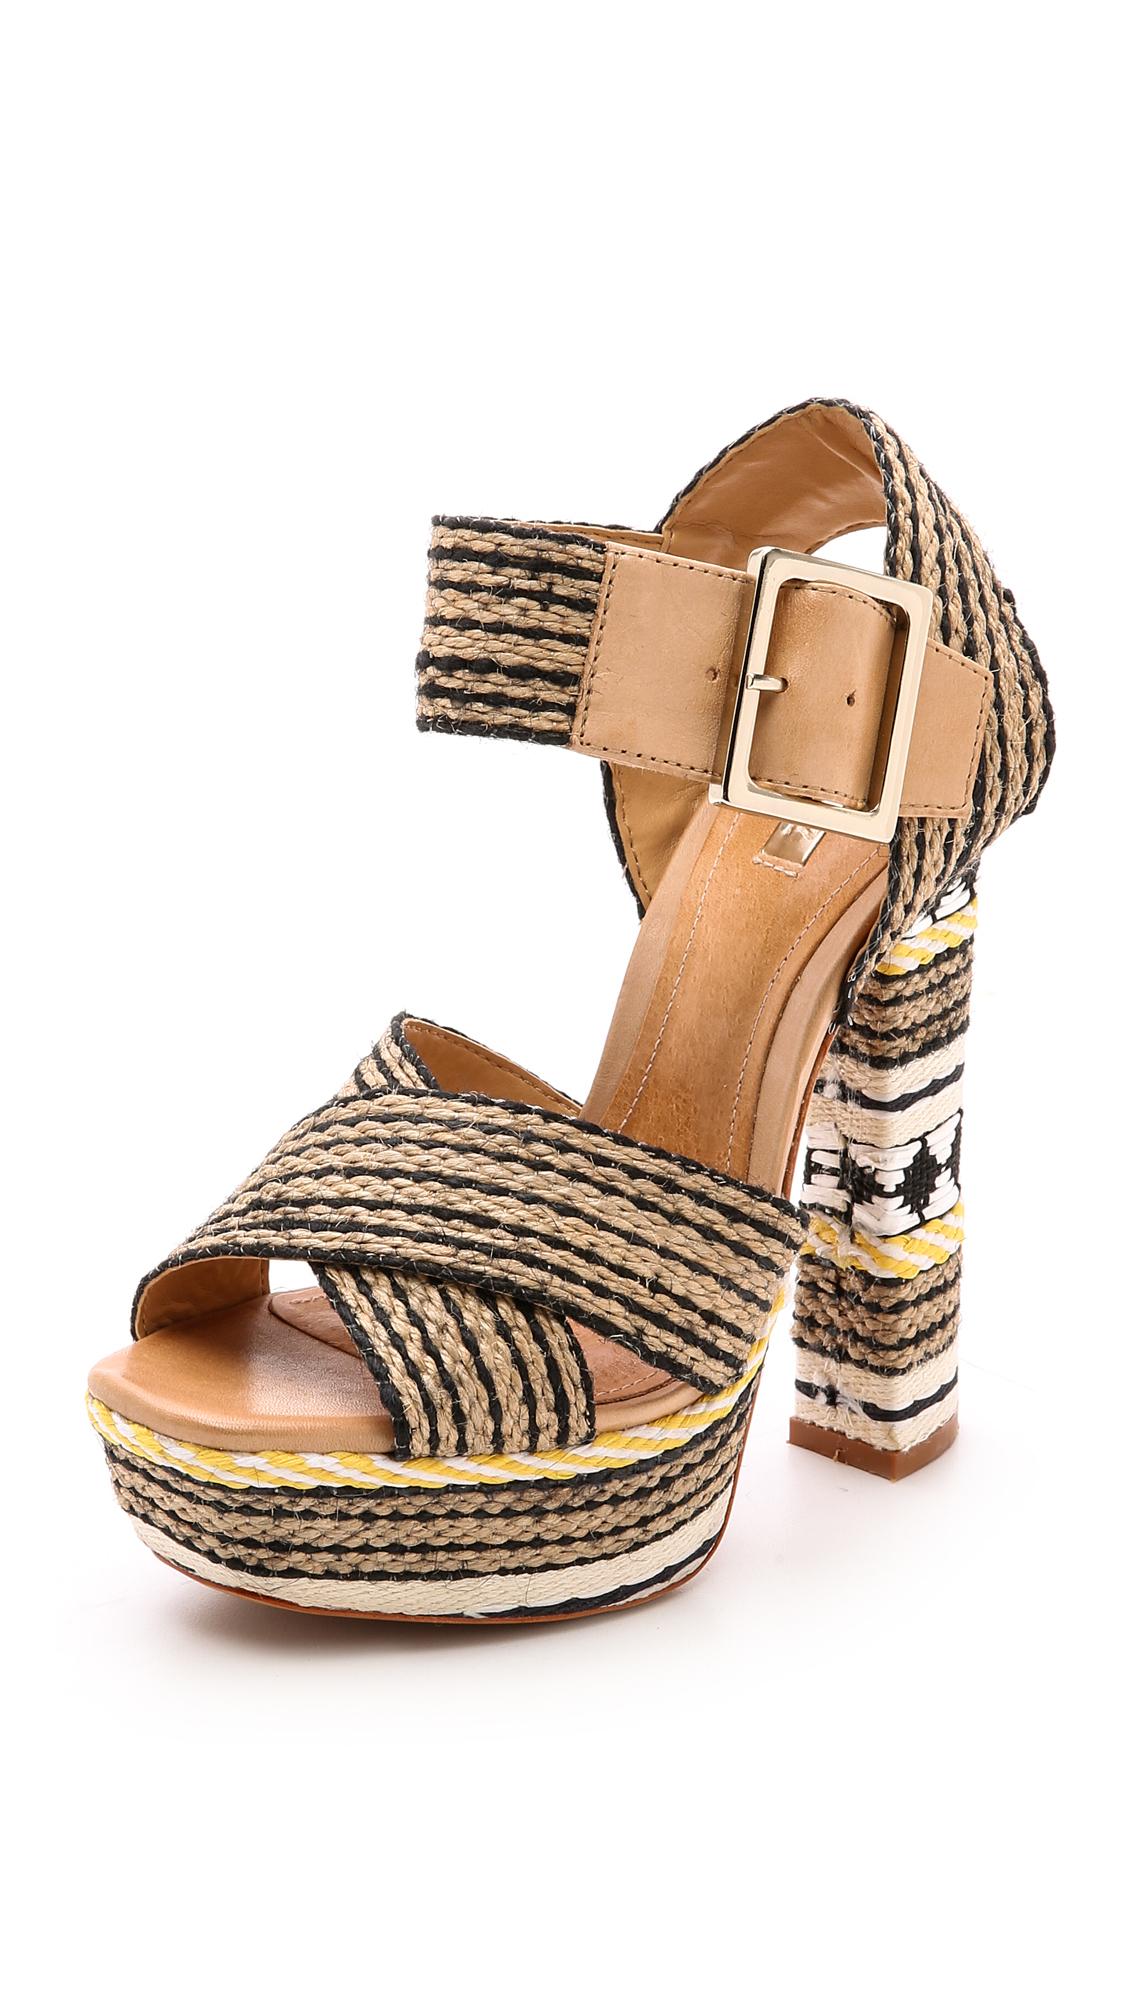 Schutz Erminiana Woven Platform Sandals Preto Natural